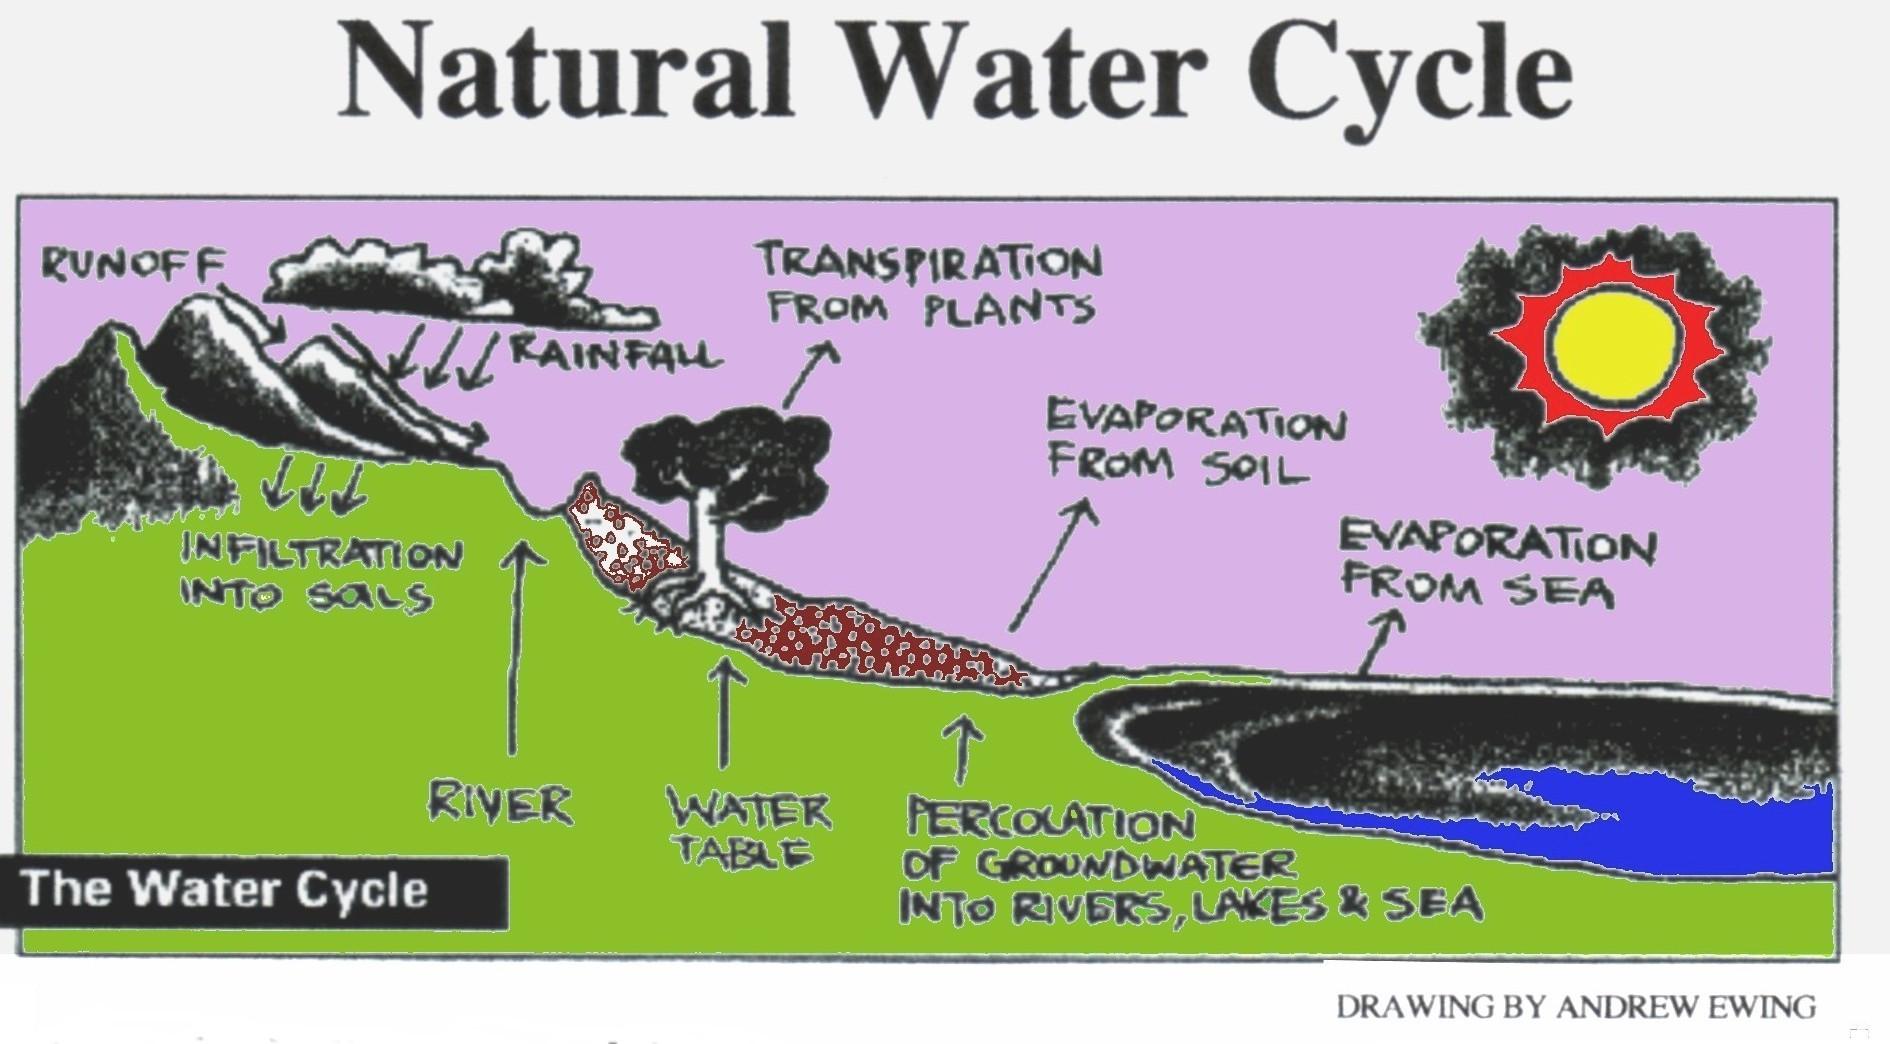 FileNatural Water Cycle 1